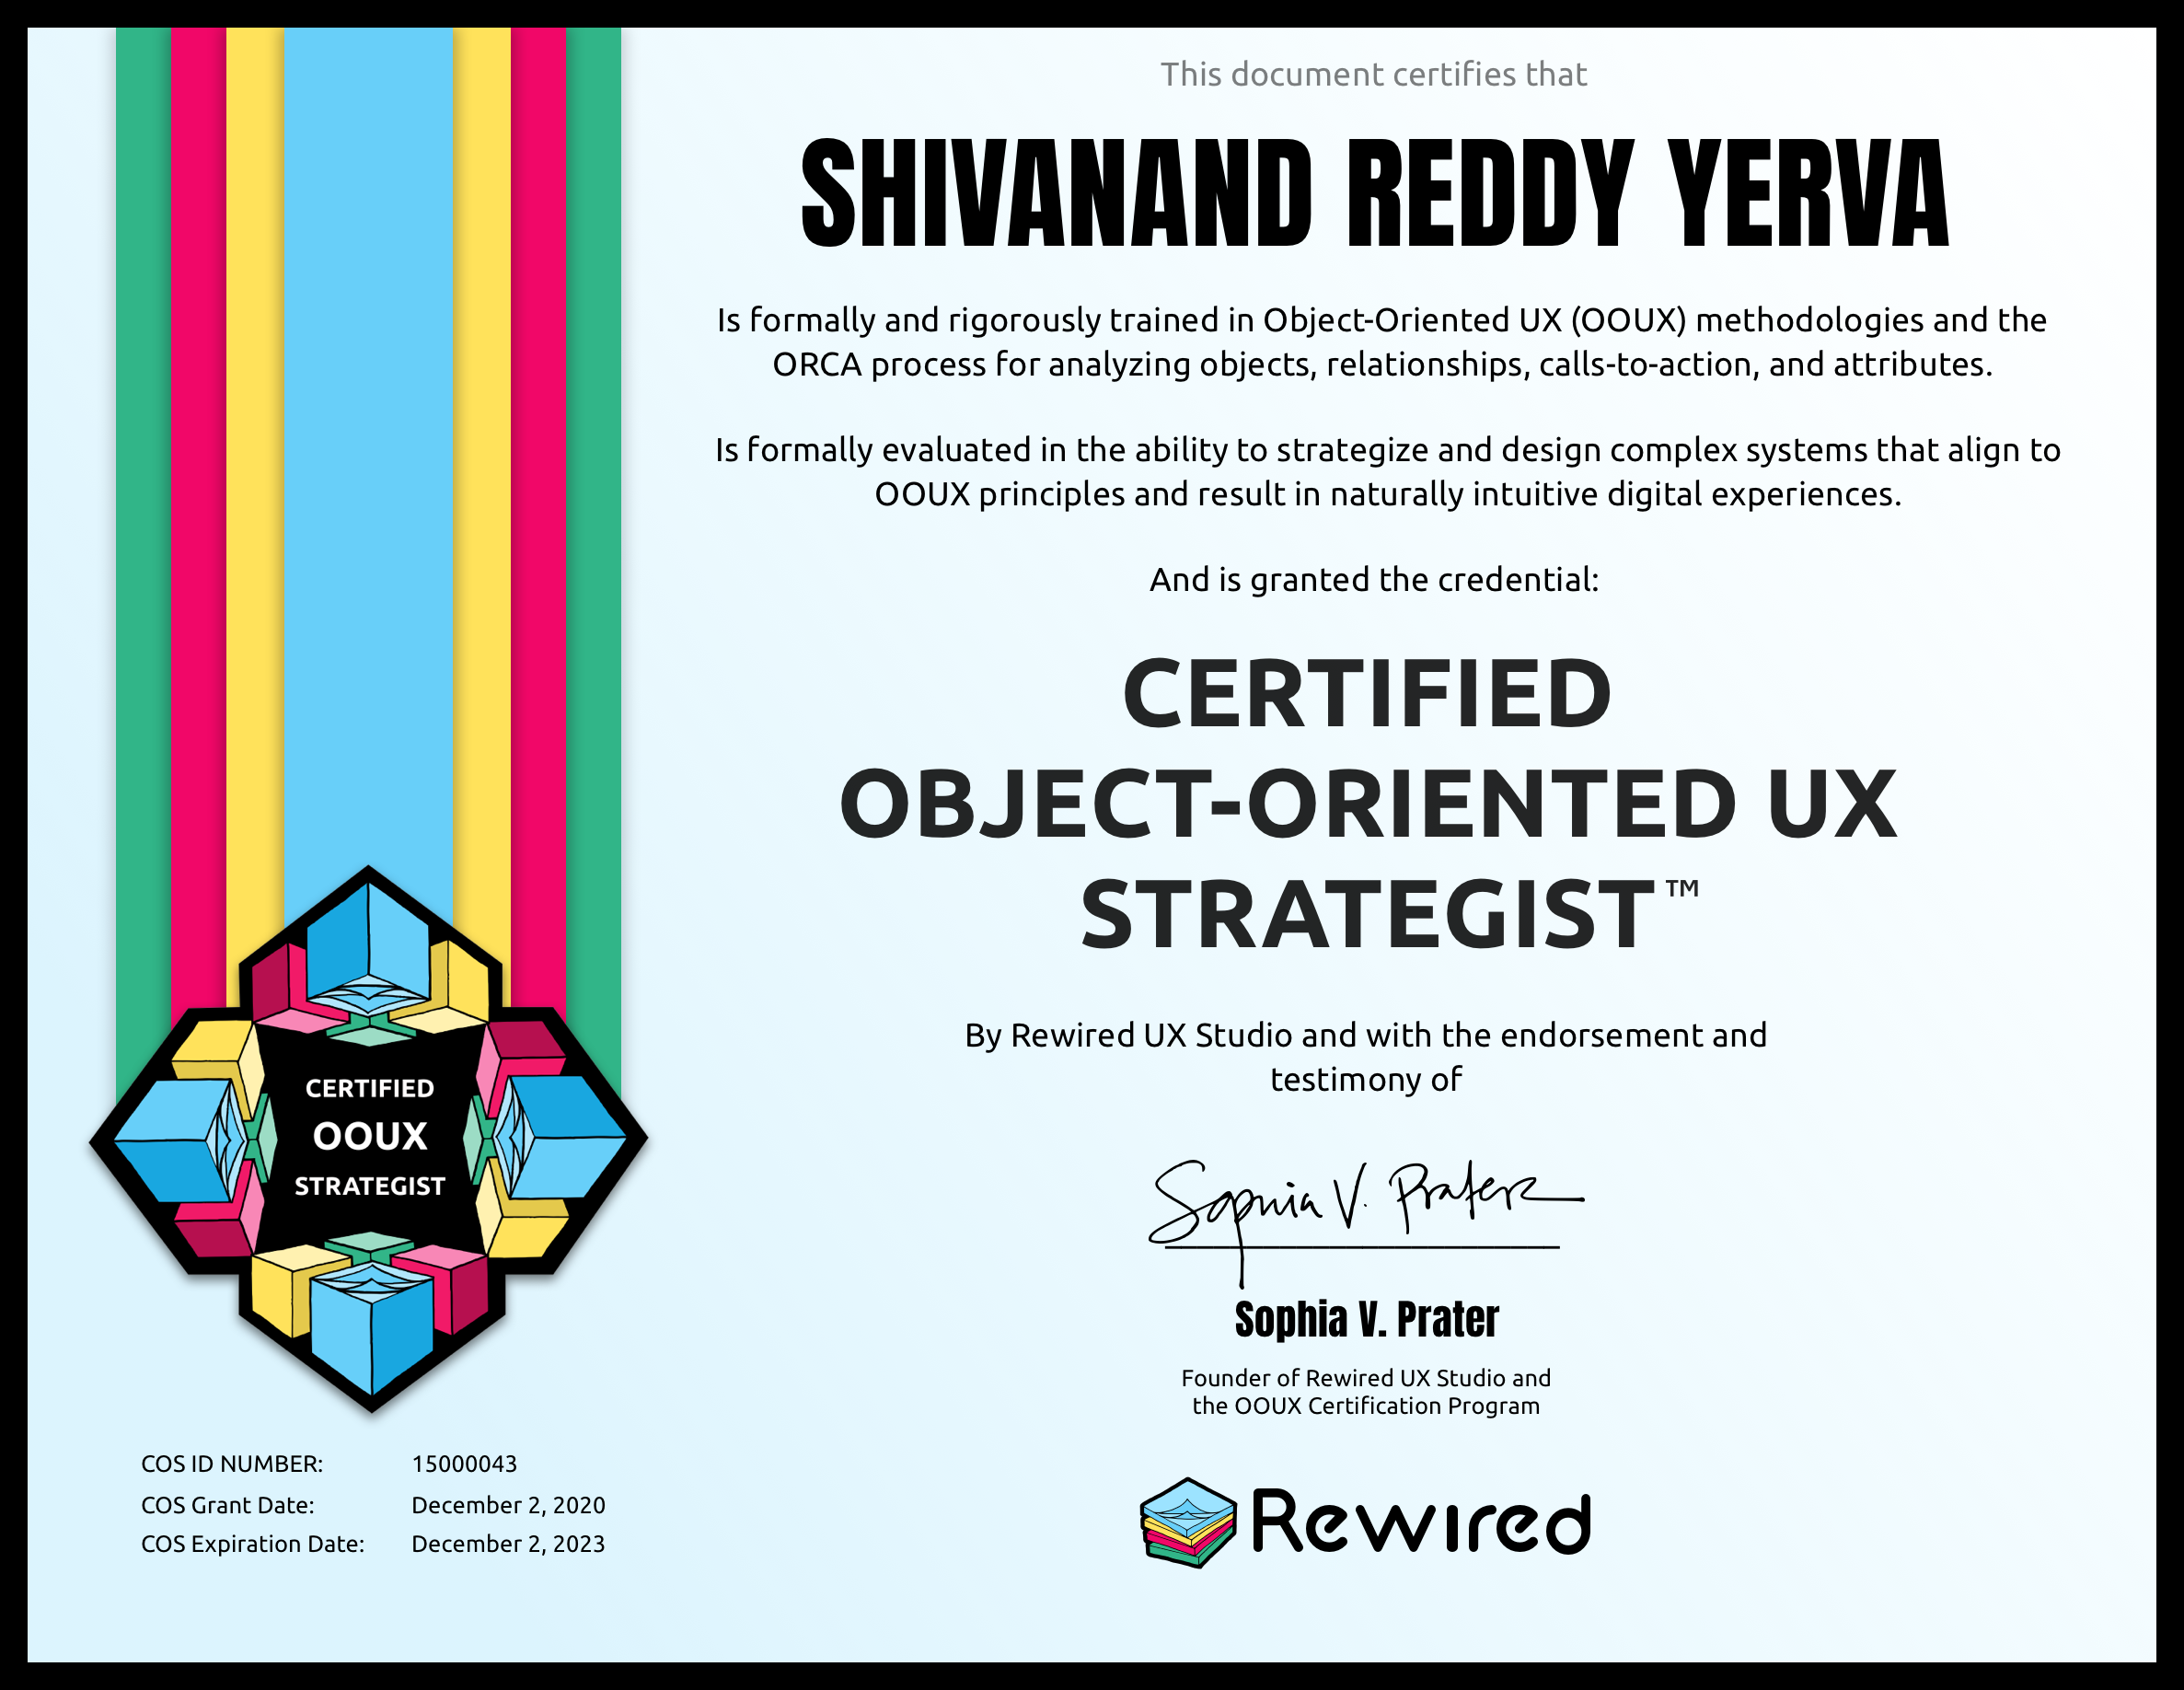 Shivanand Reddy Yerva